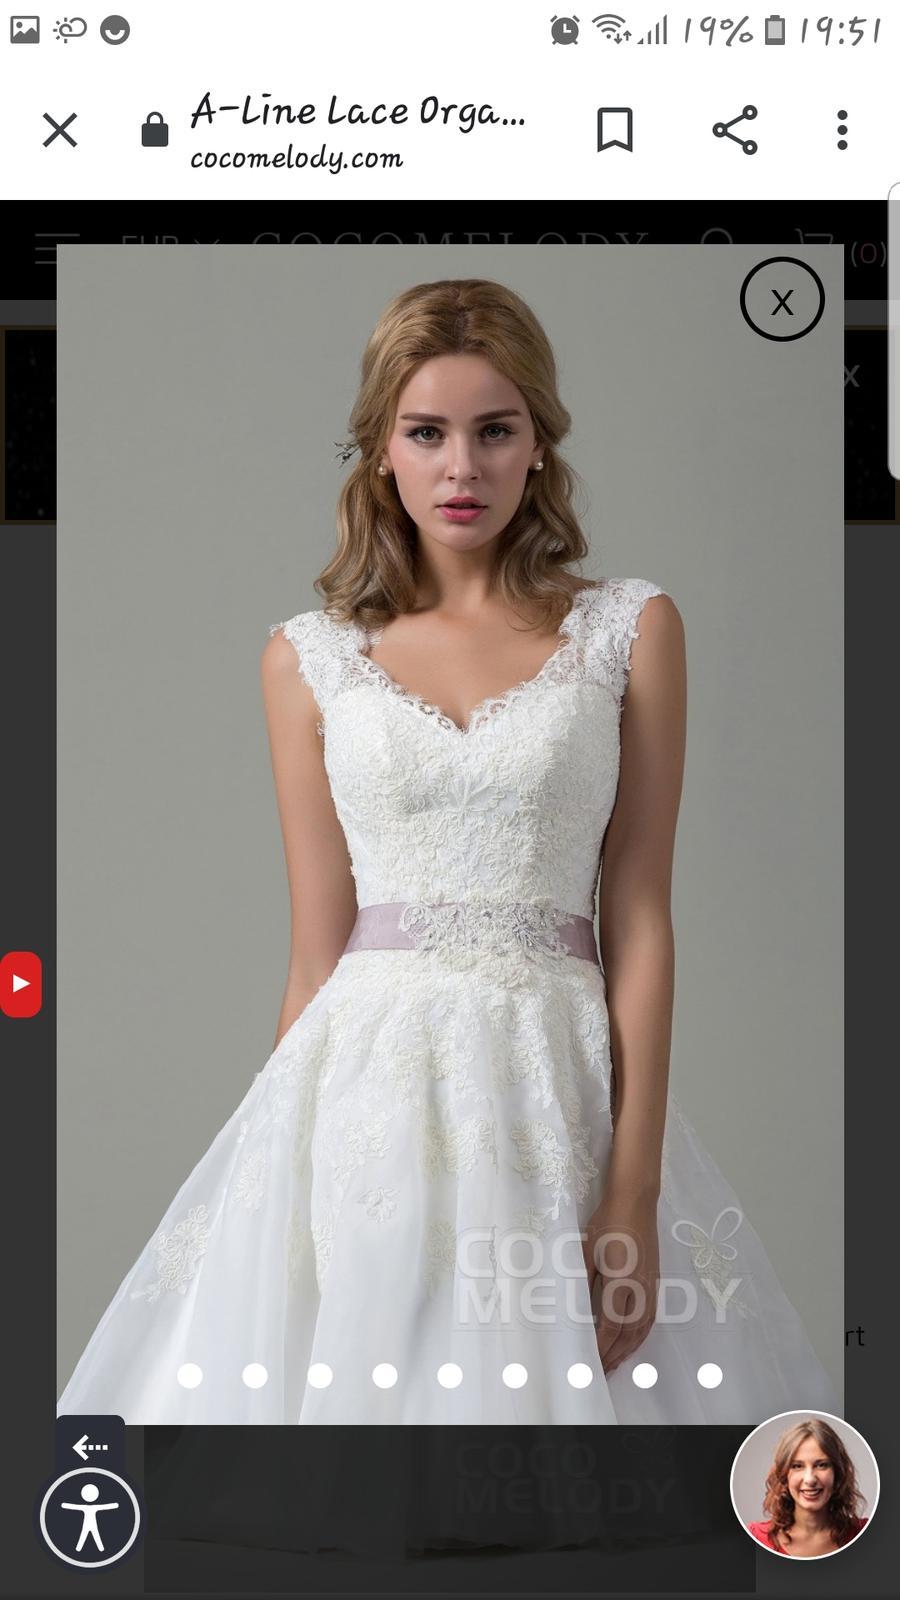 Svadobné šaty Cocomelody - Obrázok č. 1